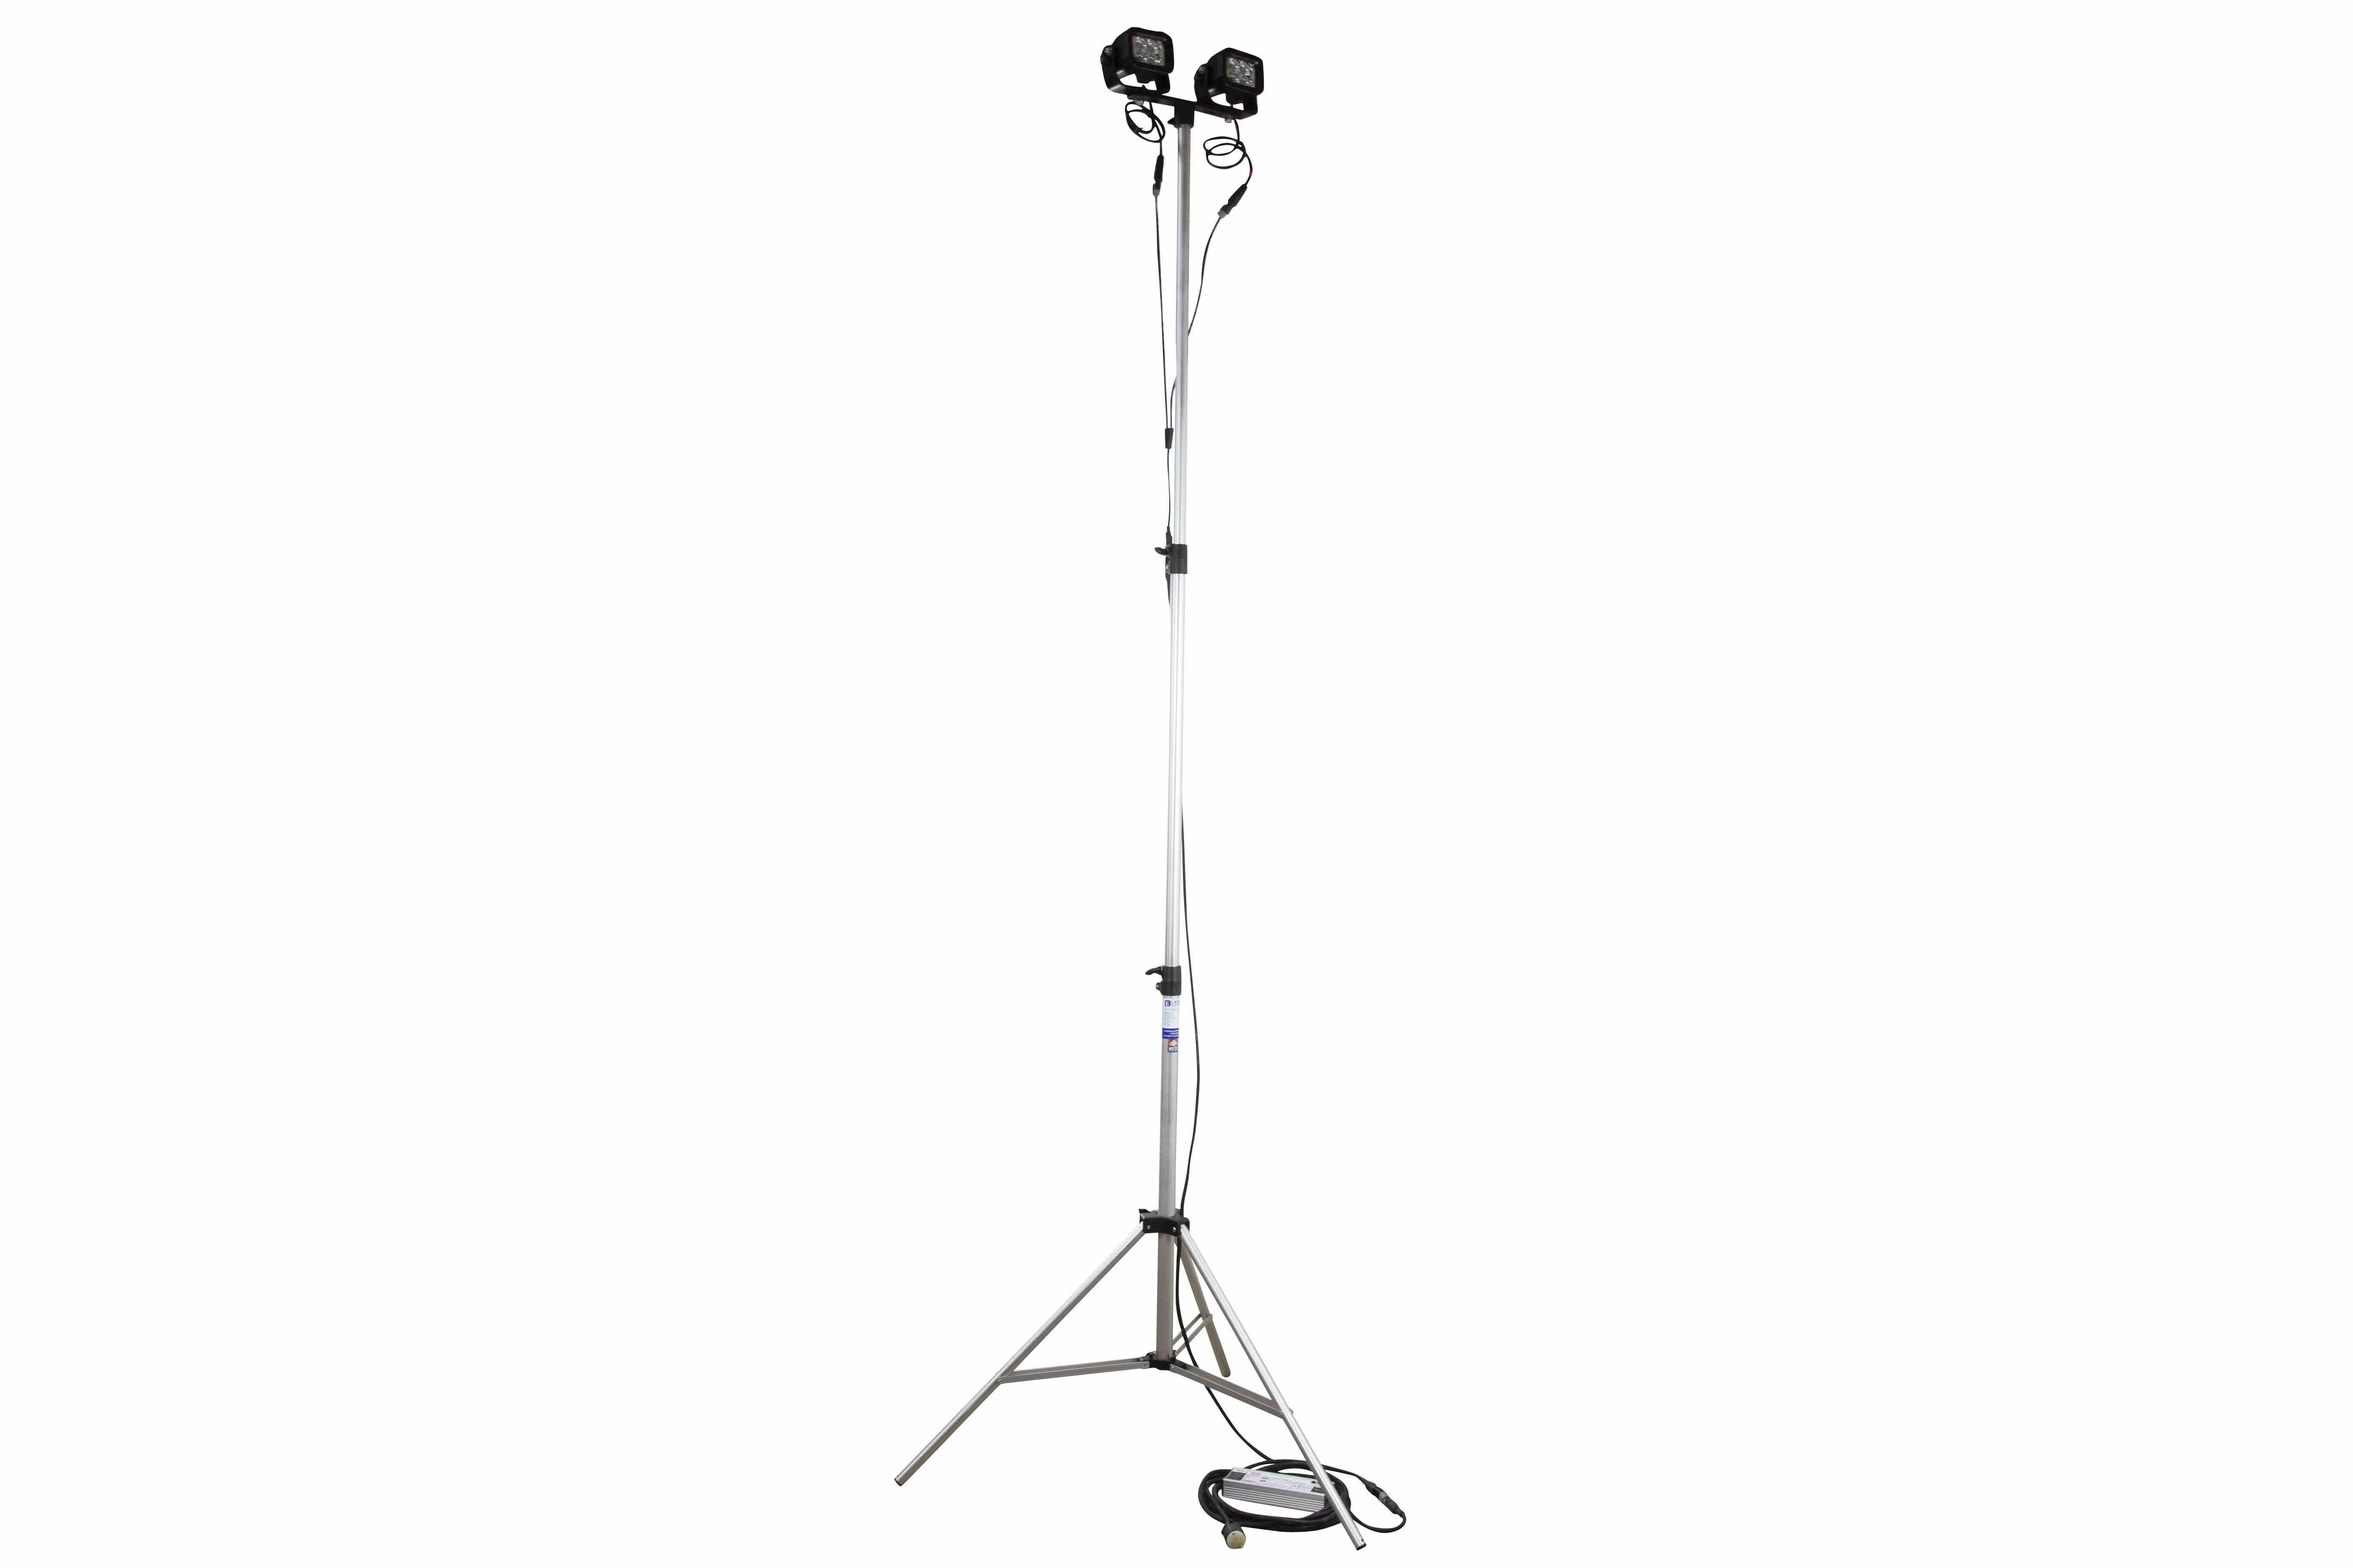 24w Portable Led Telescoping Light Tower